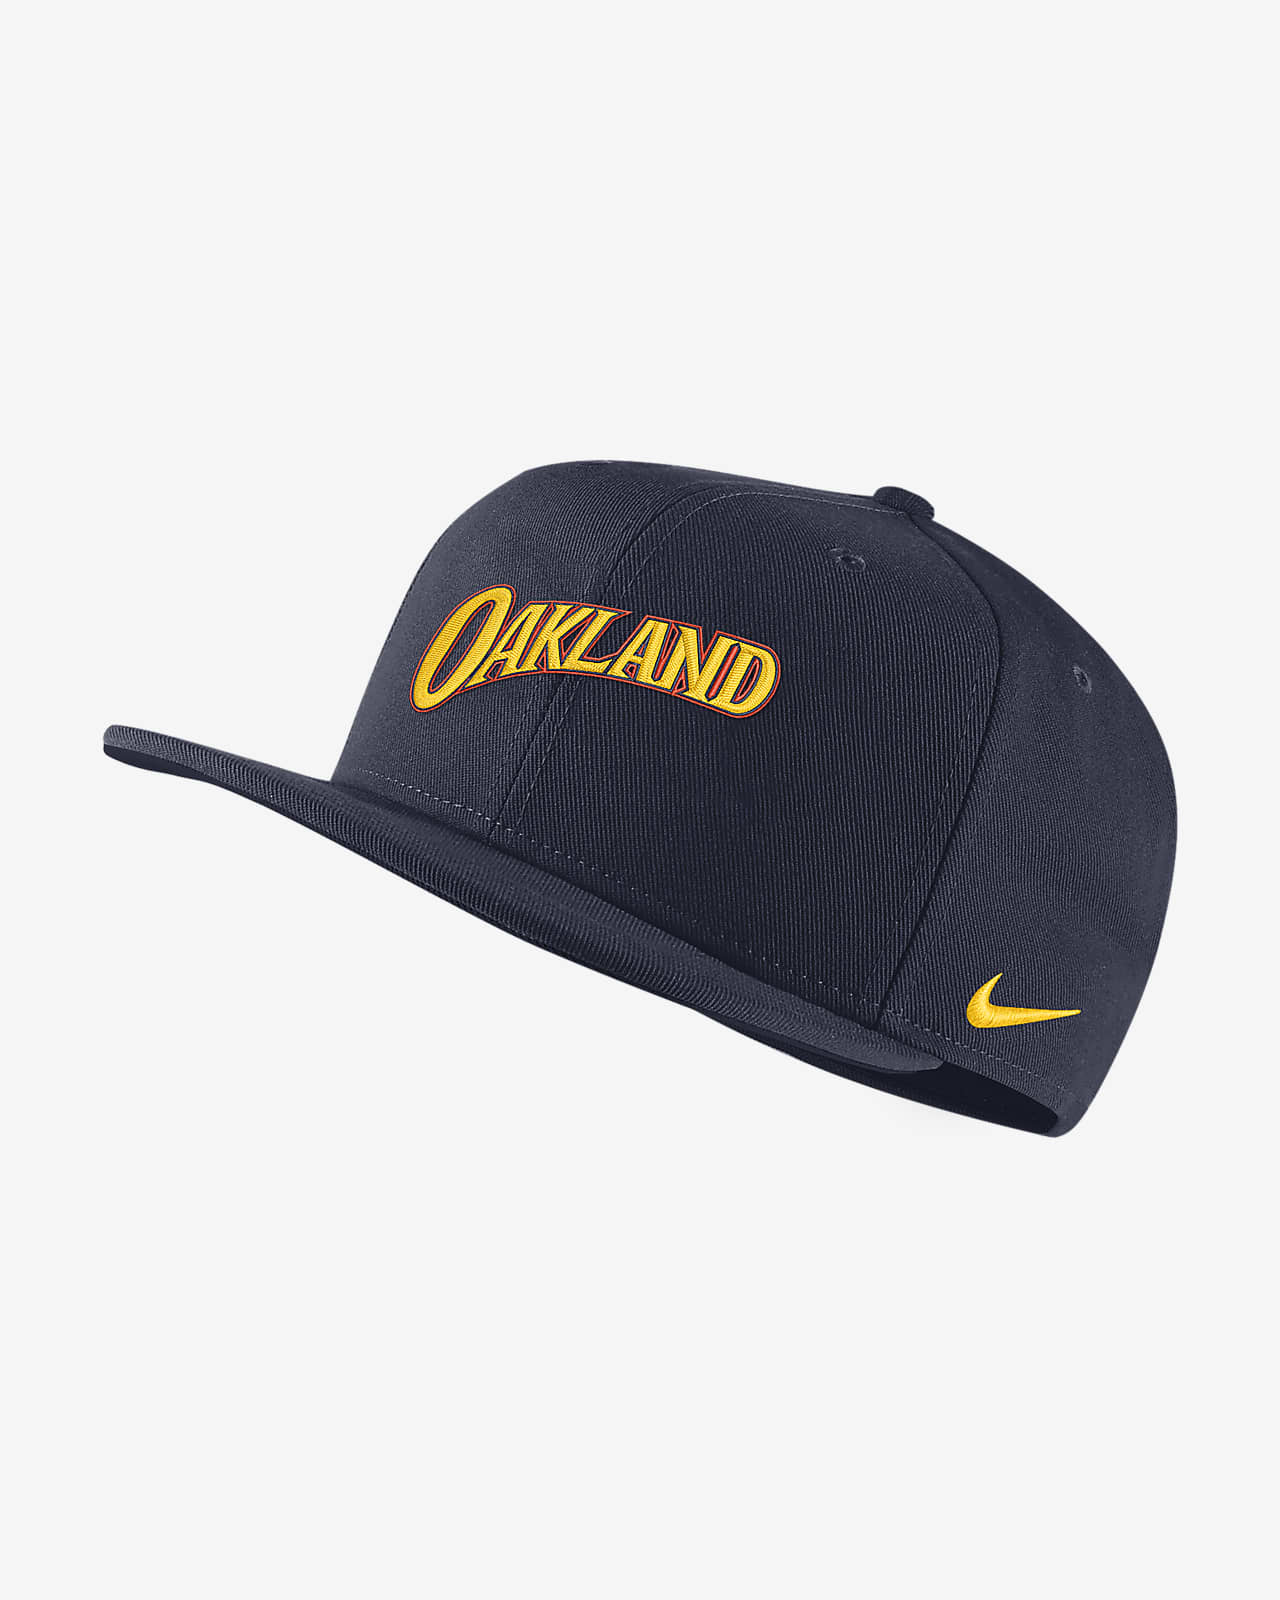 Golden State Warriors City Edition Nike Pro NBA Cap